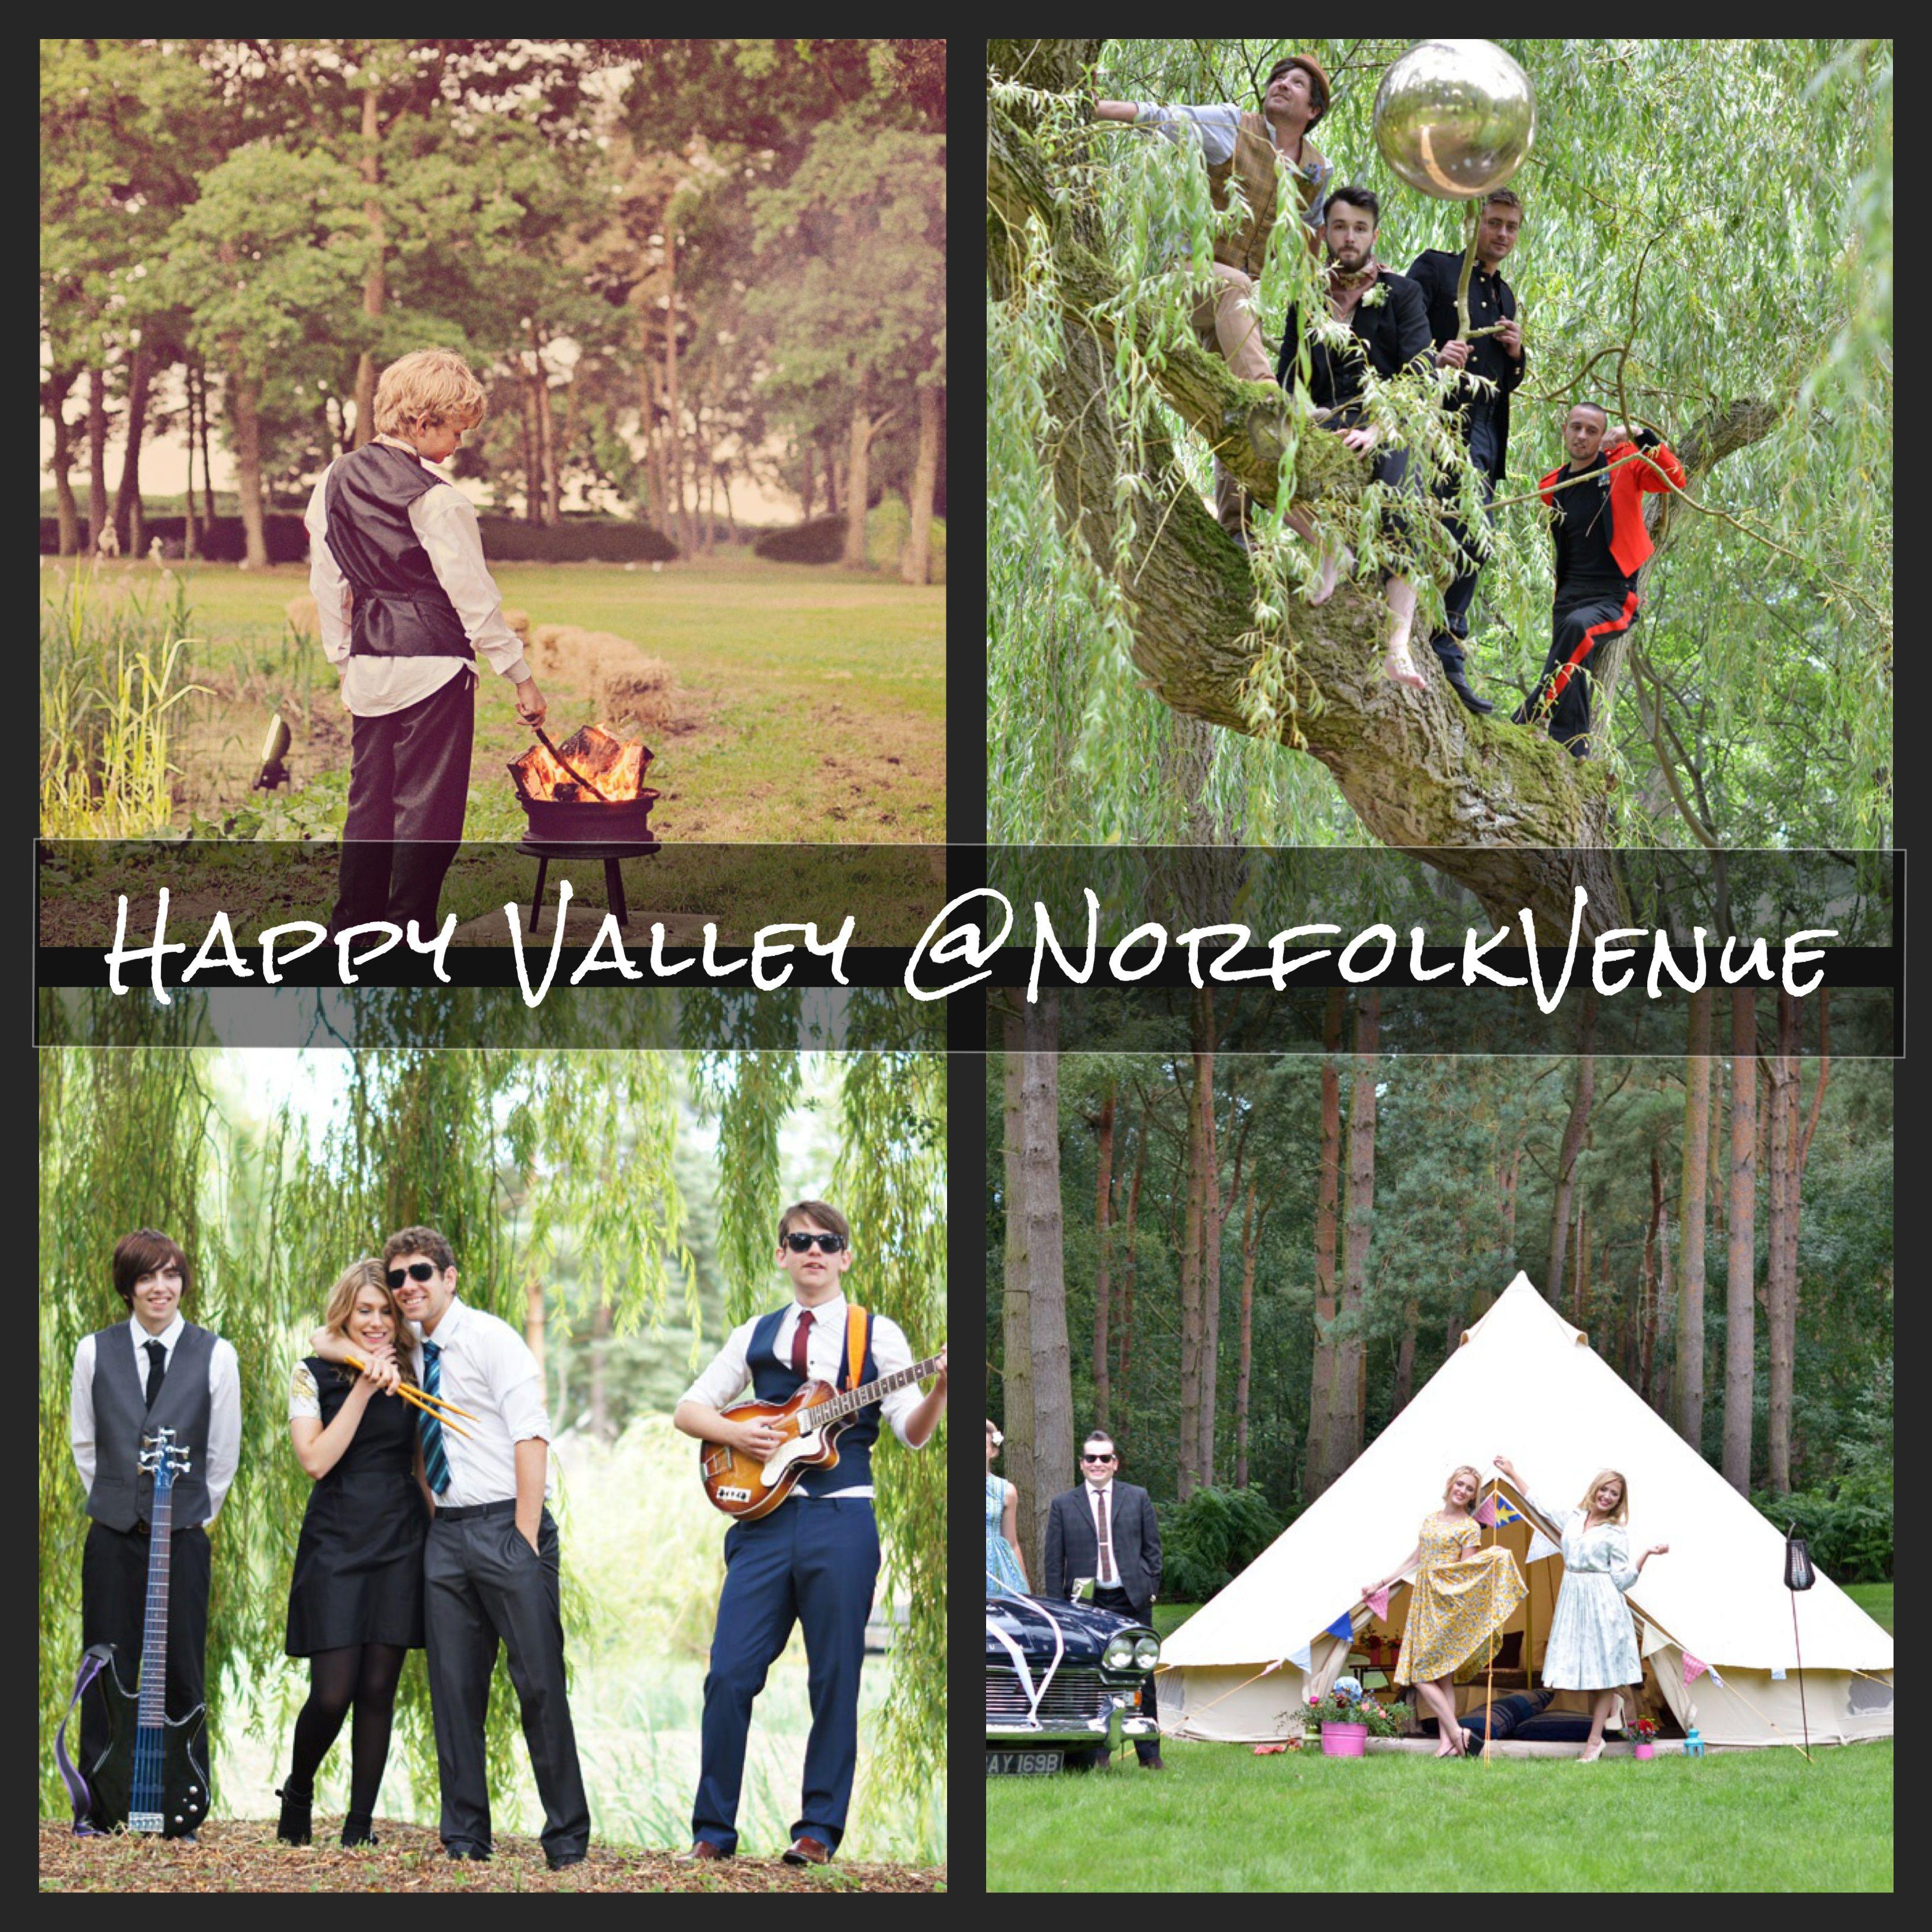 Happy Valley Norfolk - Norfolk Venue #Festivalweddings #woodlandweddings  #musicvenue #filmvenue #photoshoots